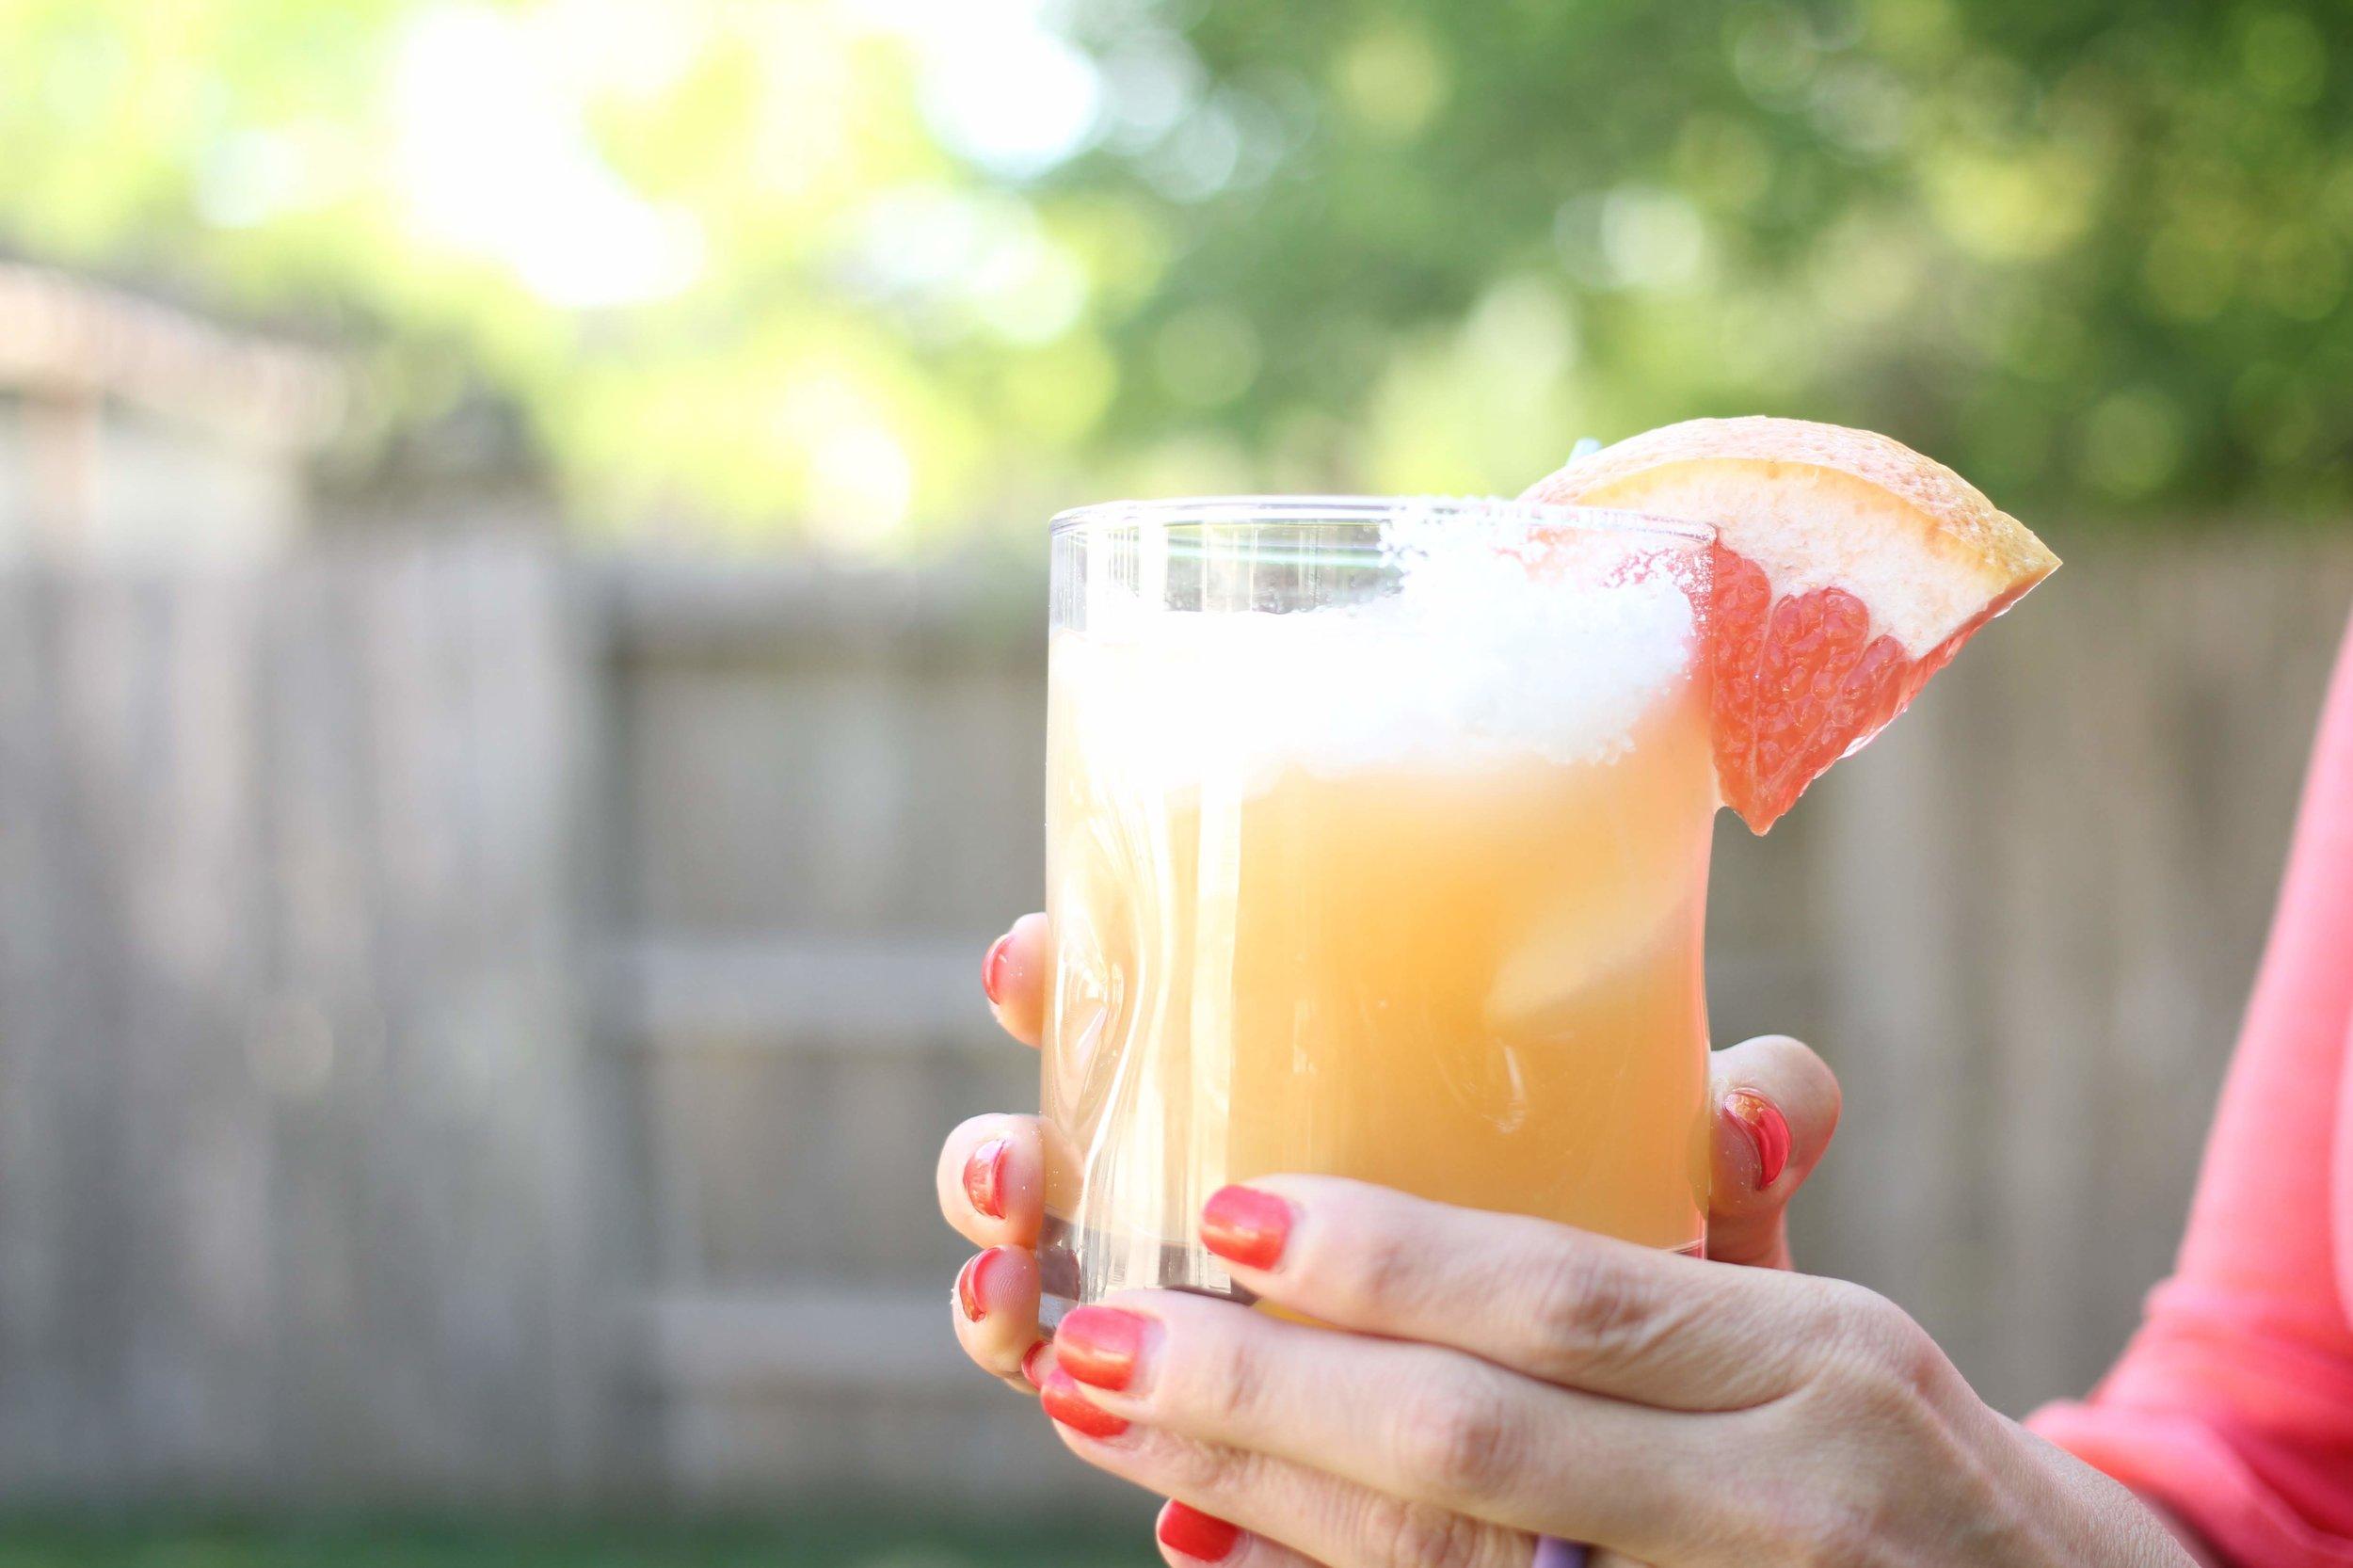 paloma sparkling drink